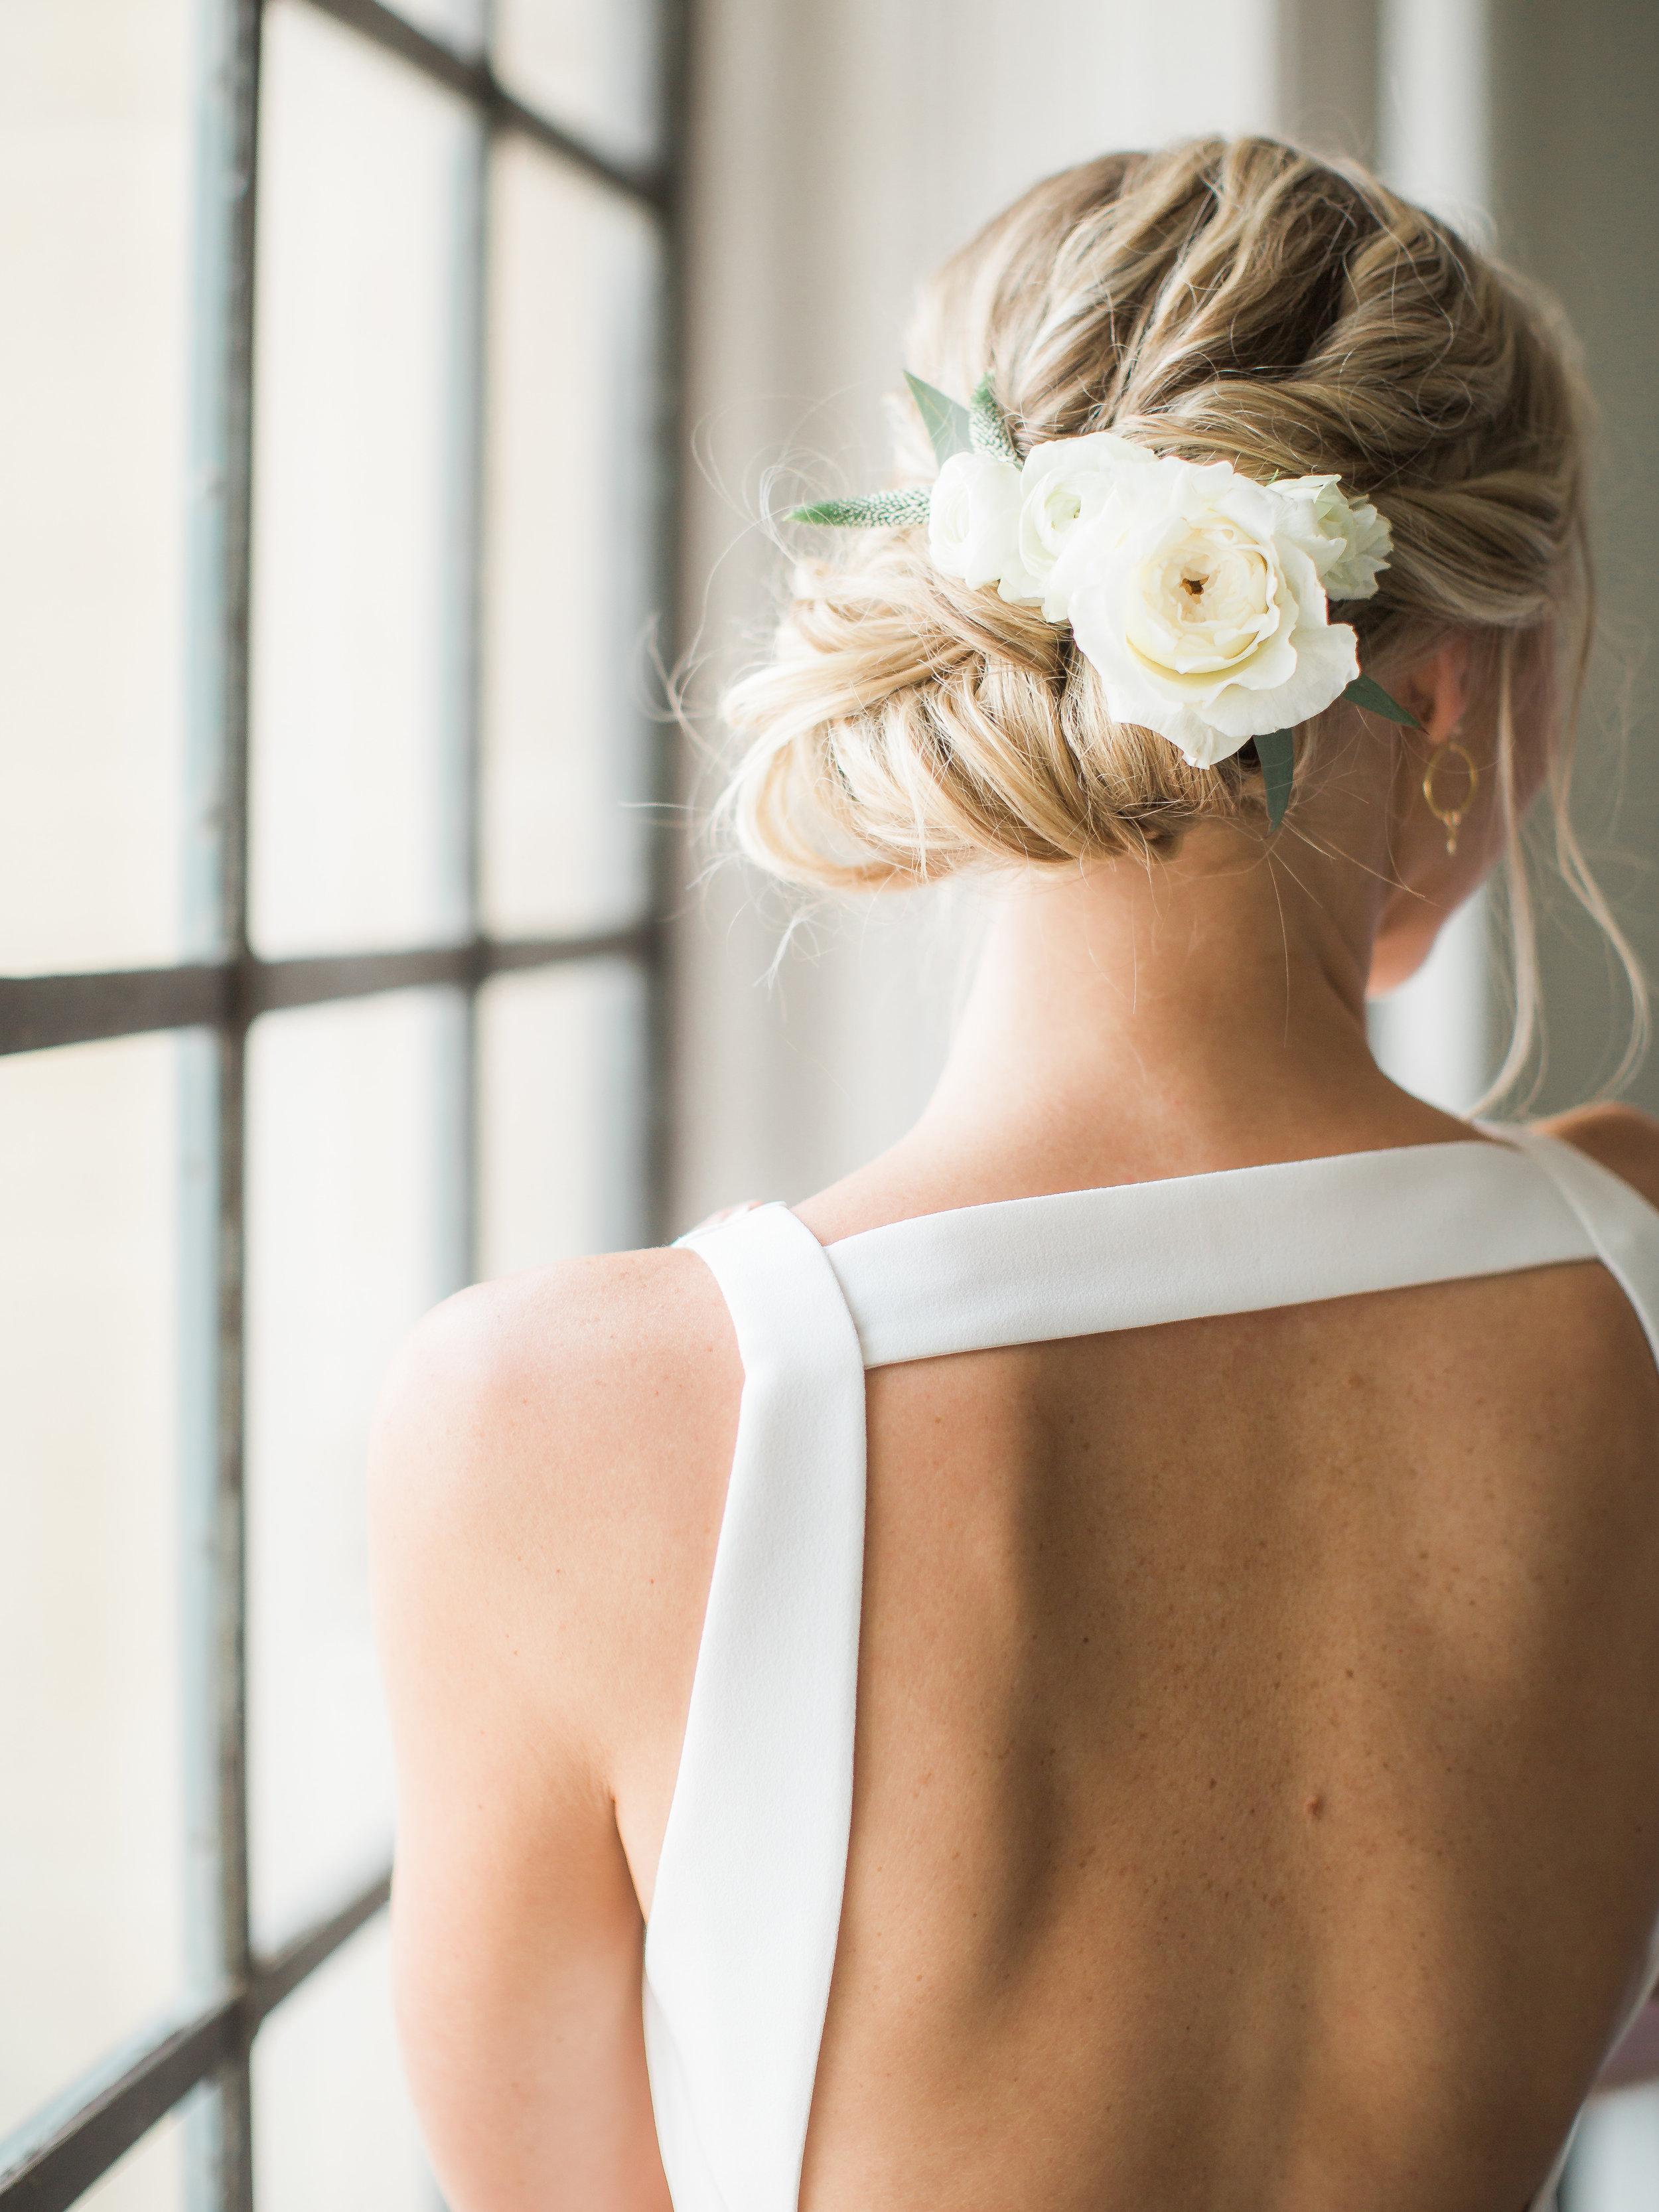 Clean_Modern_Wedding_Florals_Sibyl_Sophia_Tablescape_Hair_Clip.JPG